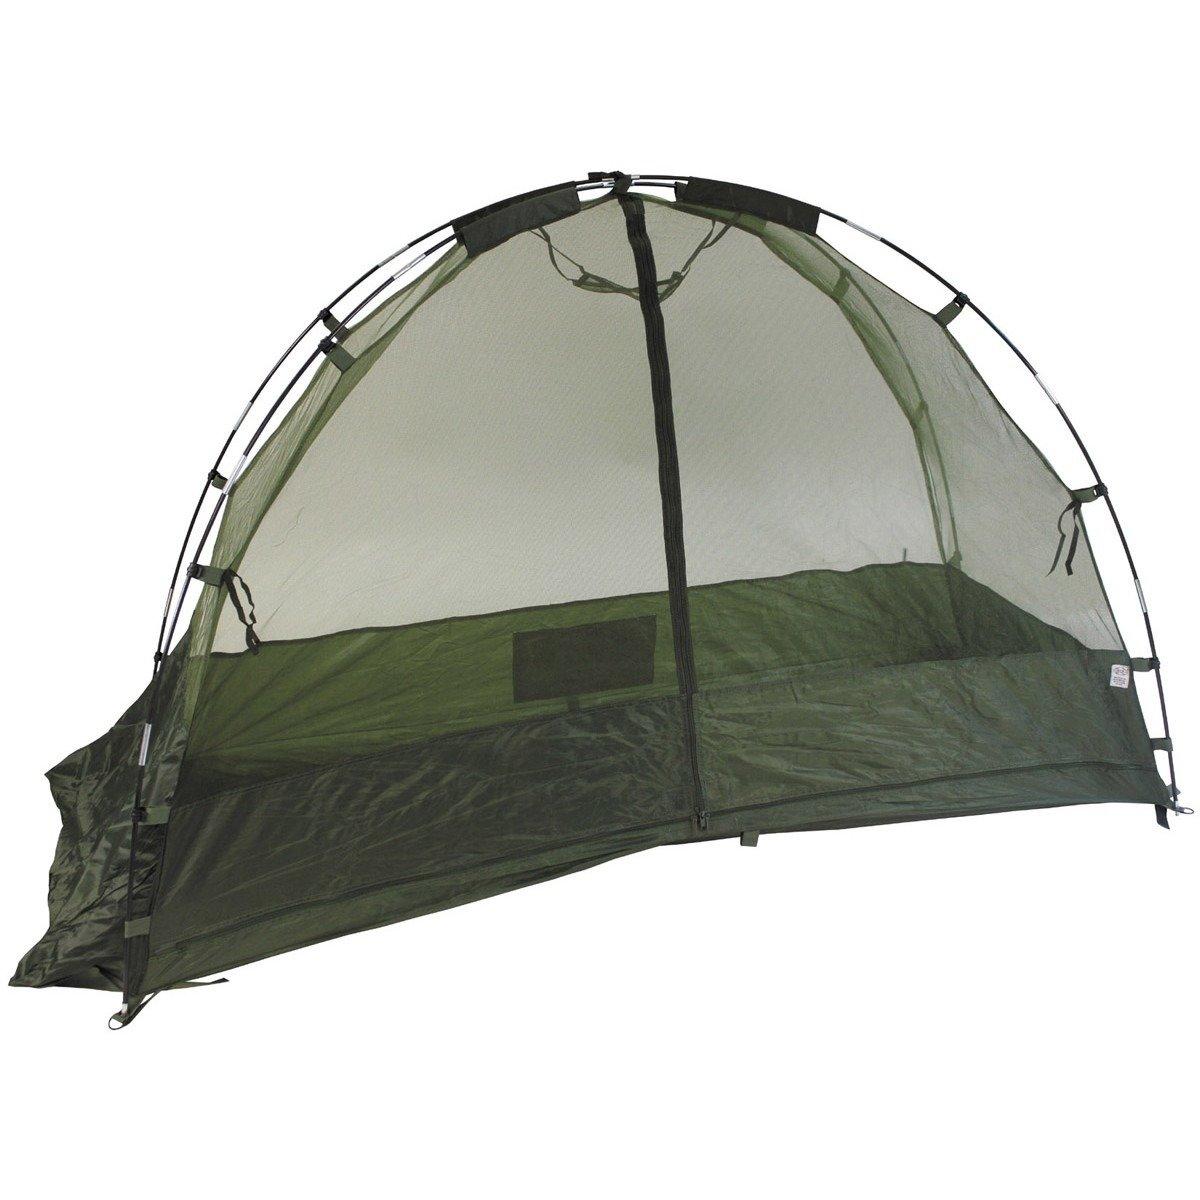 ... GB mosquito net tent-shaped OD green ...  sc 1 st  militarysurplus & GB mosquito net tent-shaped OD green | Trekking \ Camping ...